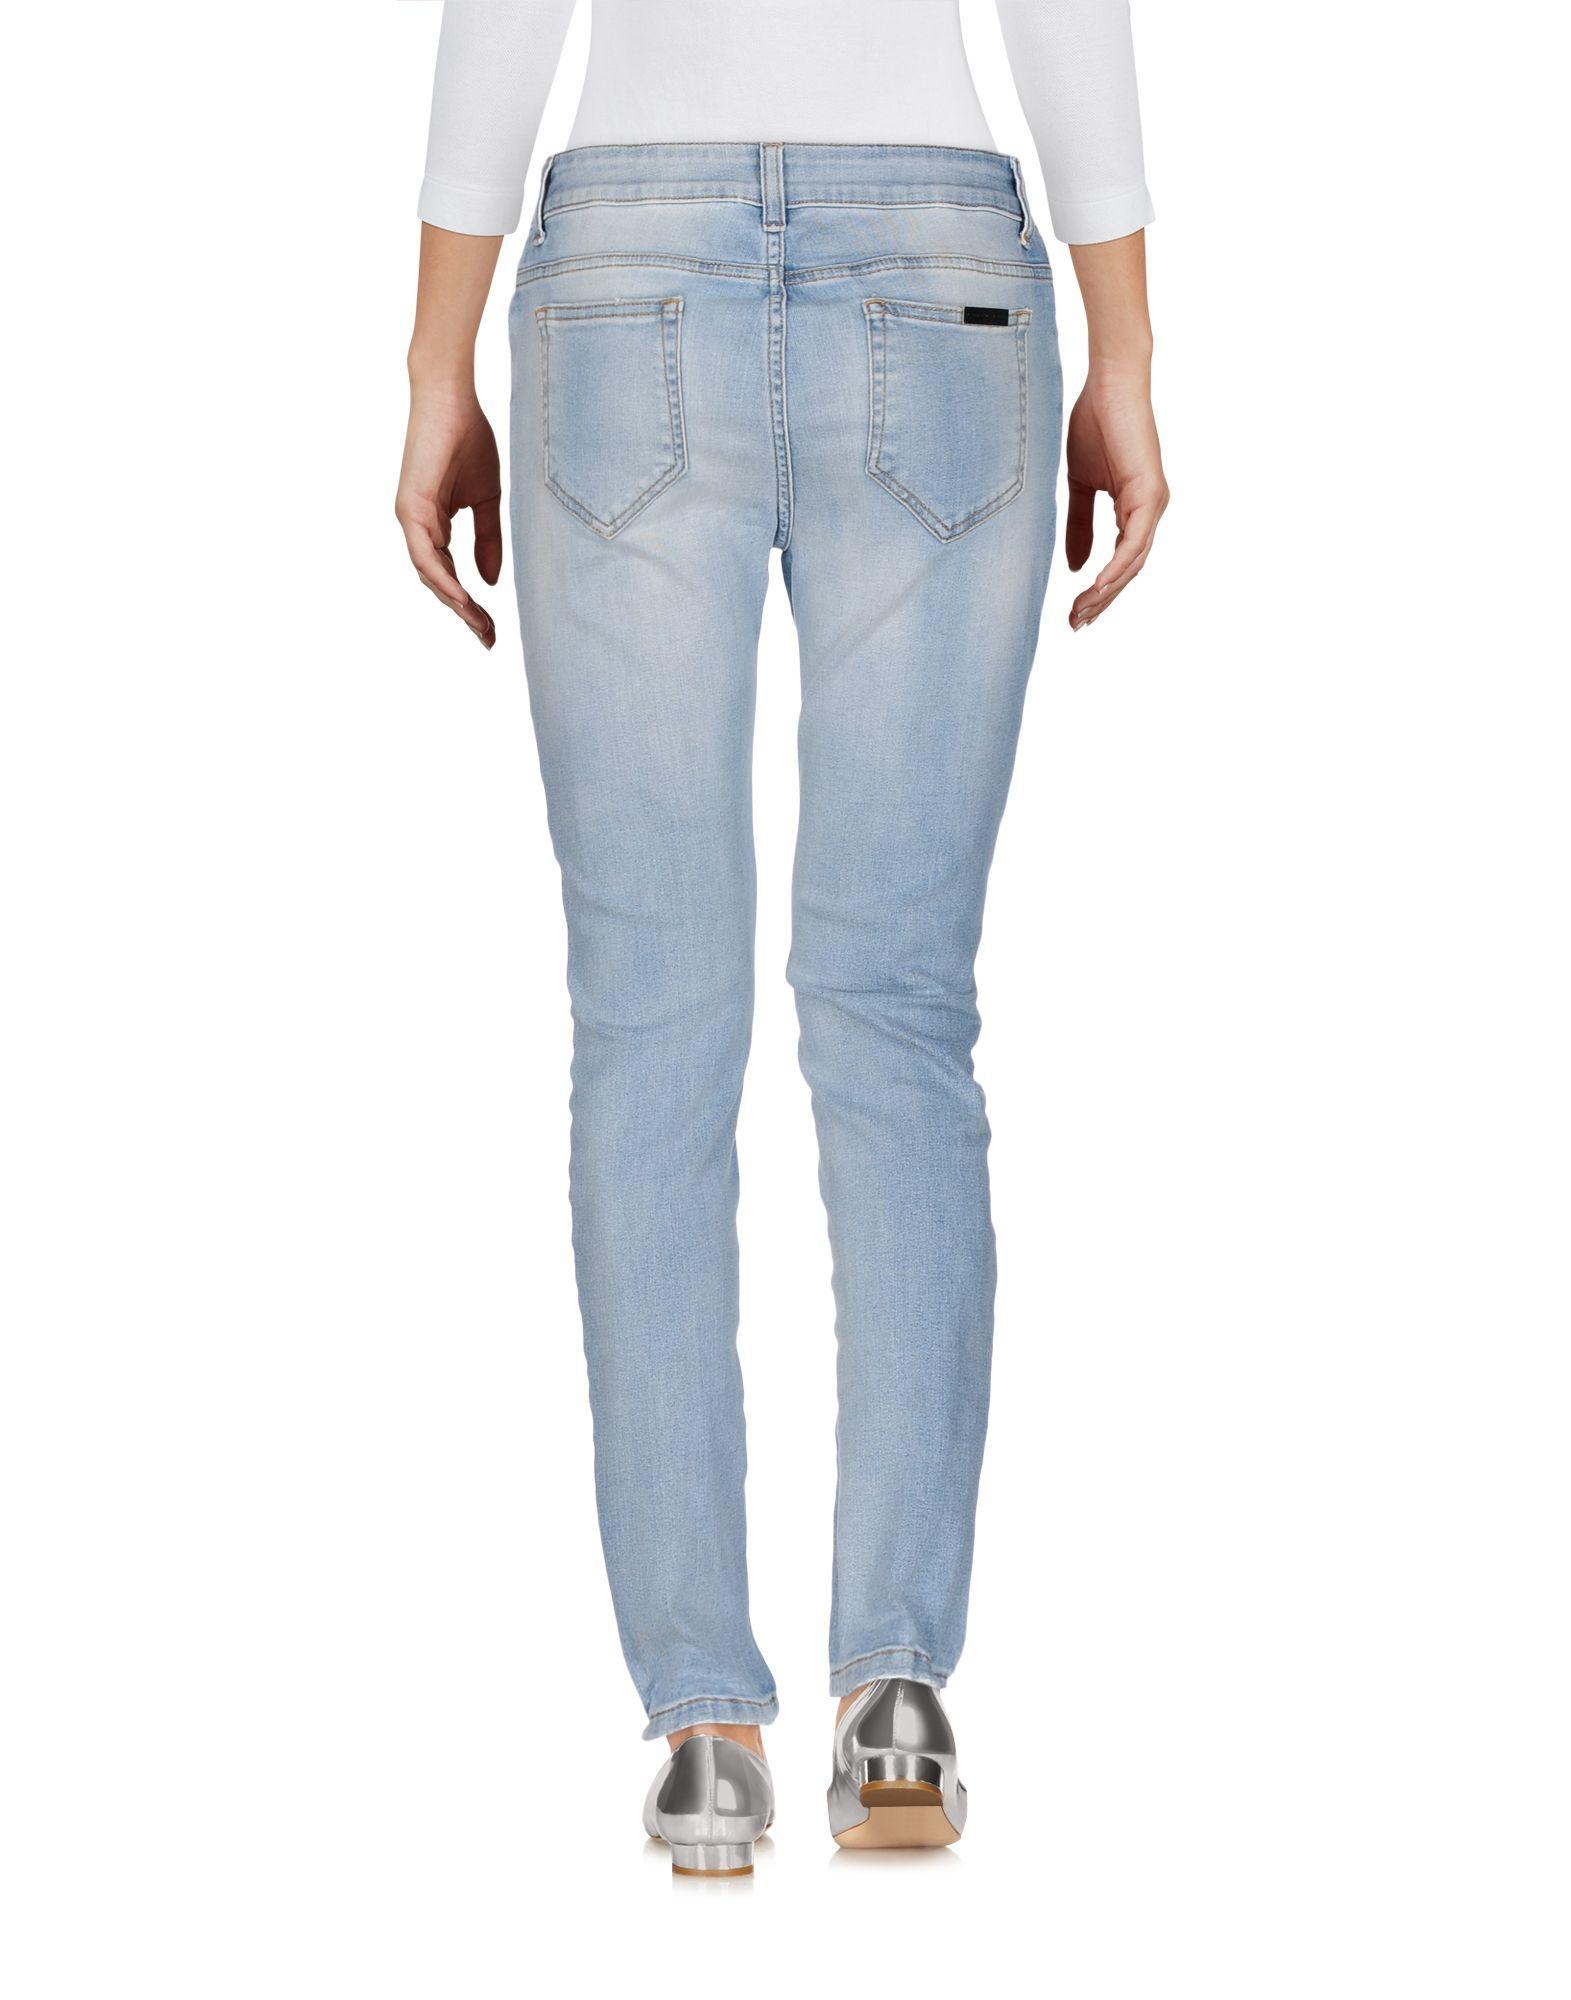 Atos Lombardini Blue Cotton Light Wash Jeans